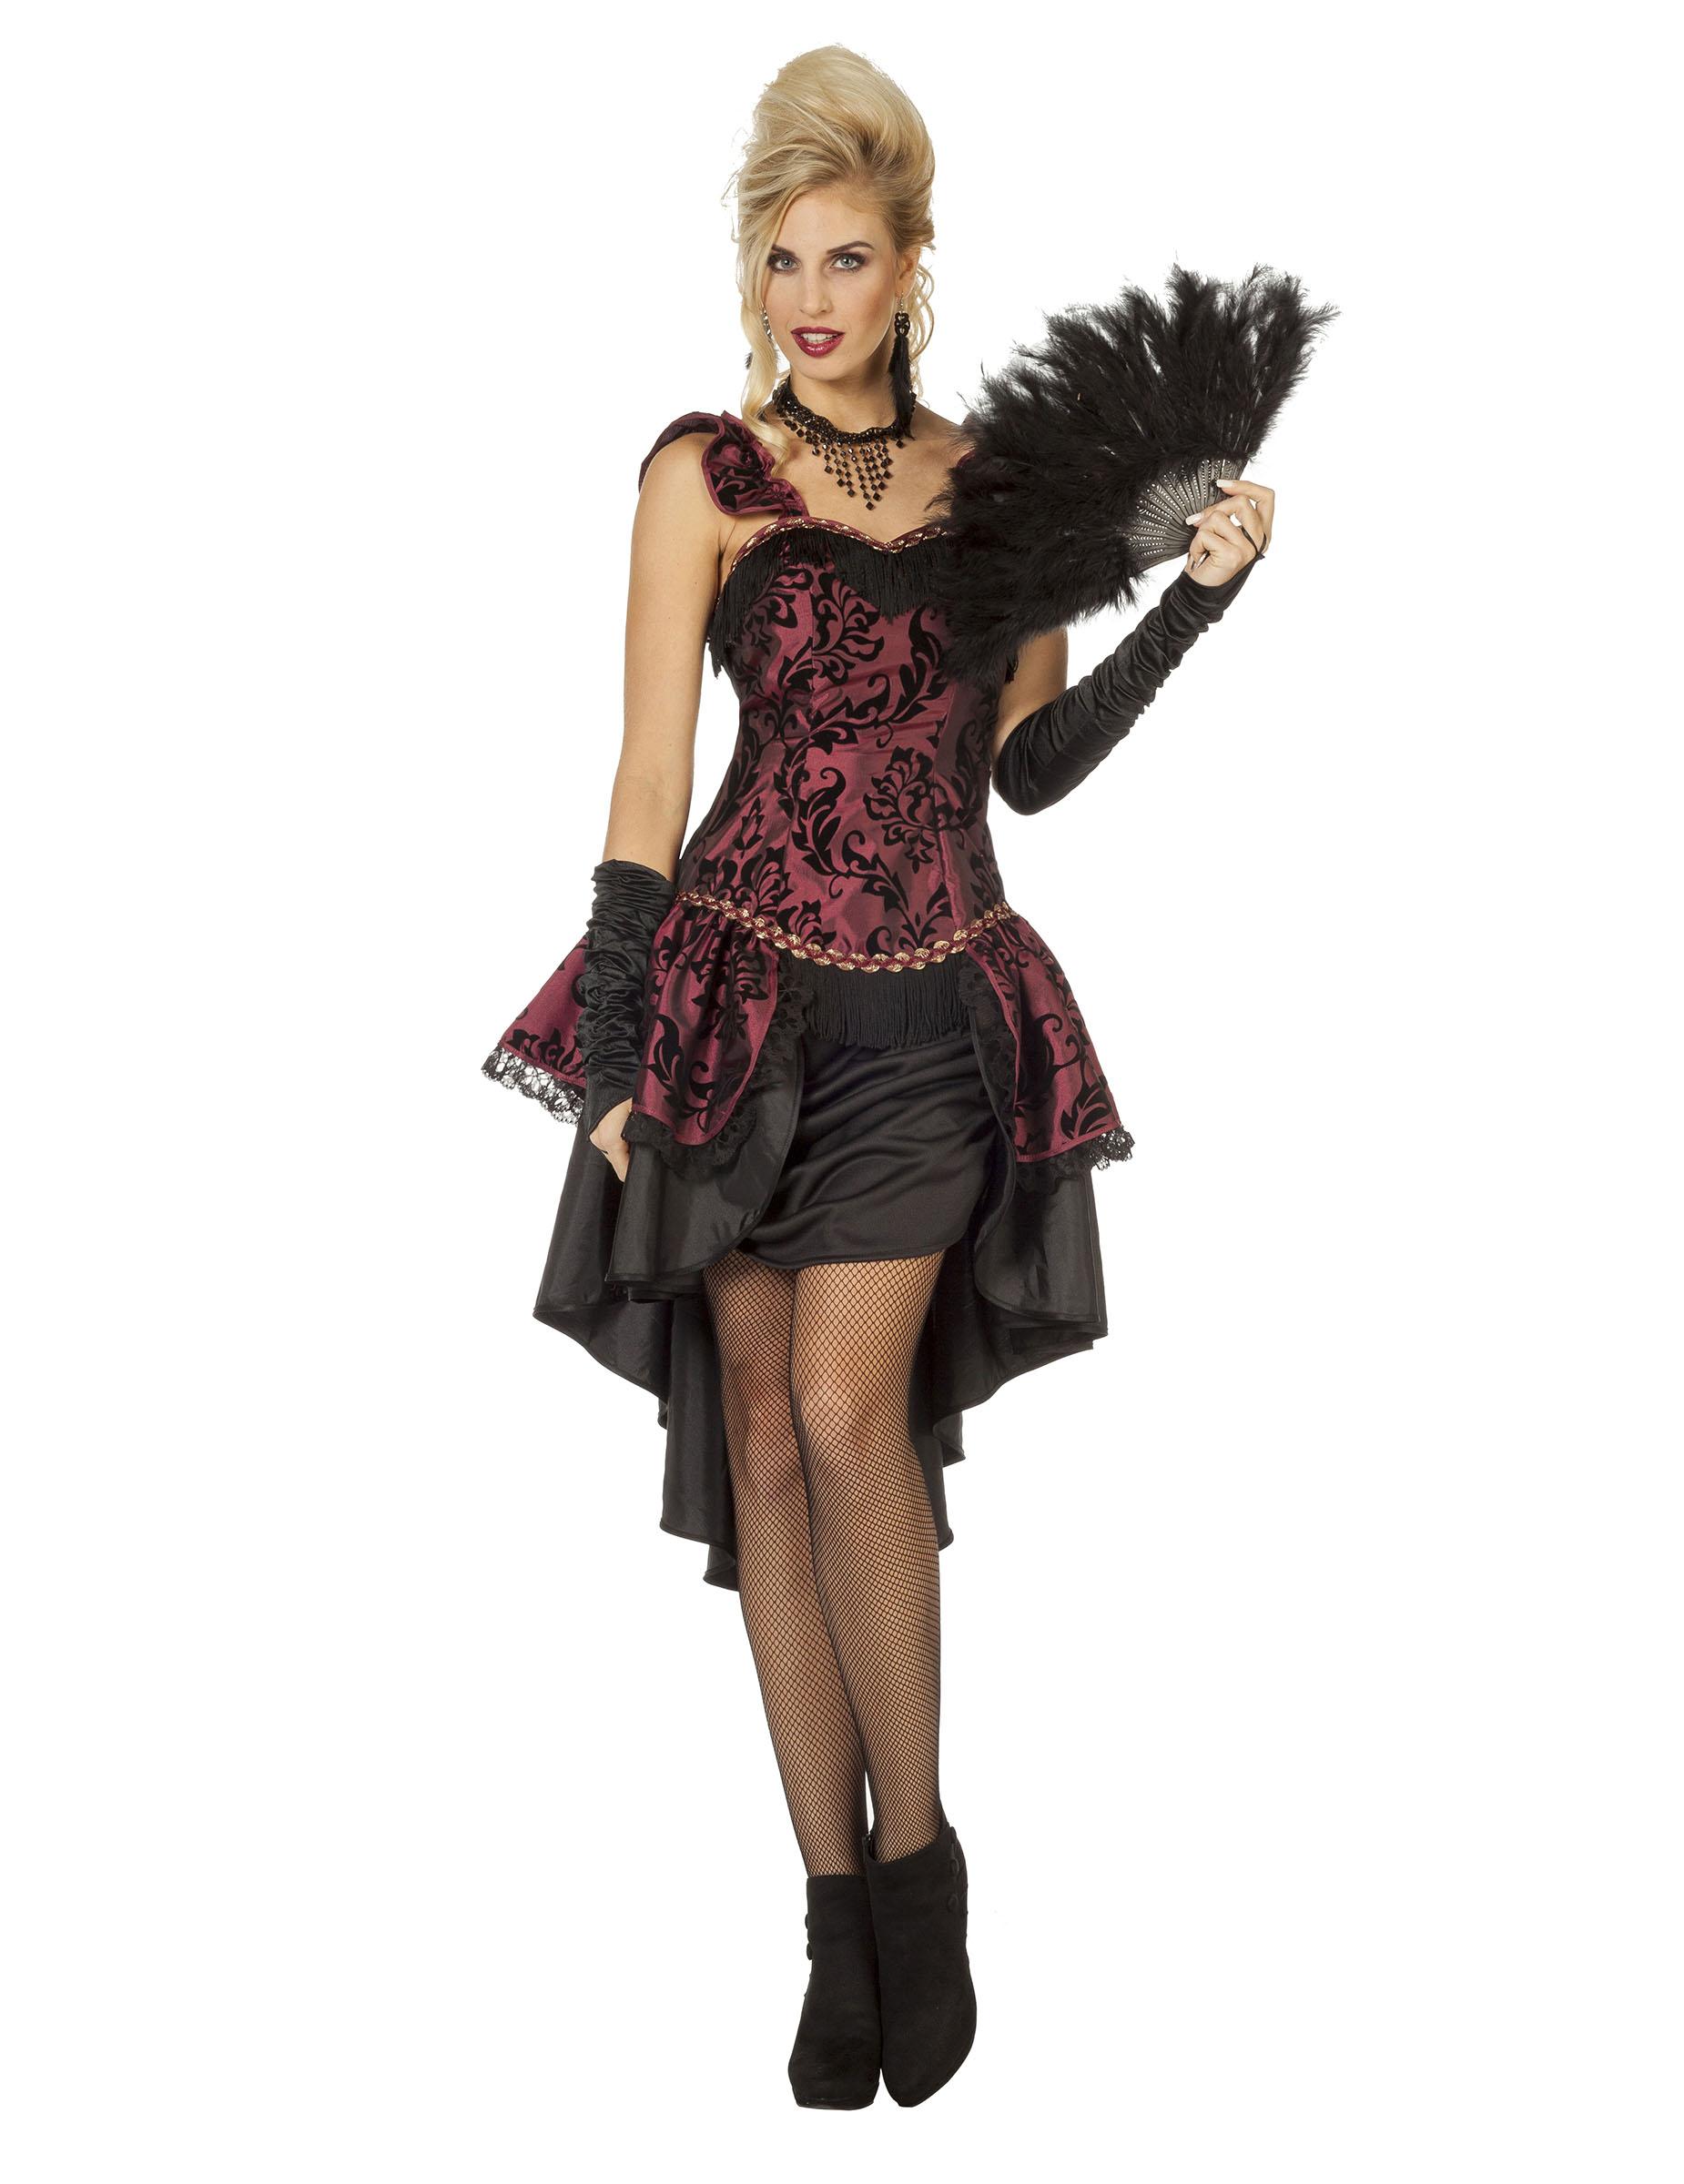 Costume burlesque sexy per donna